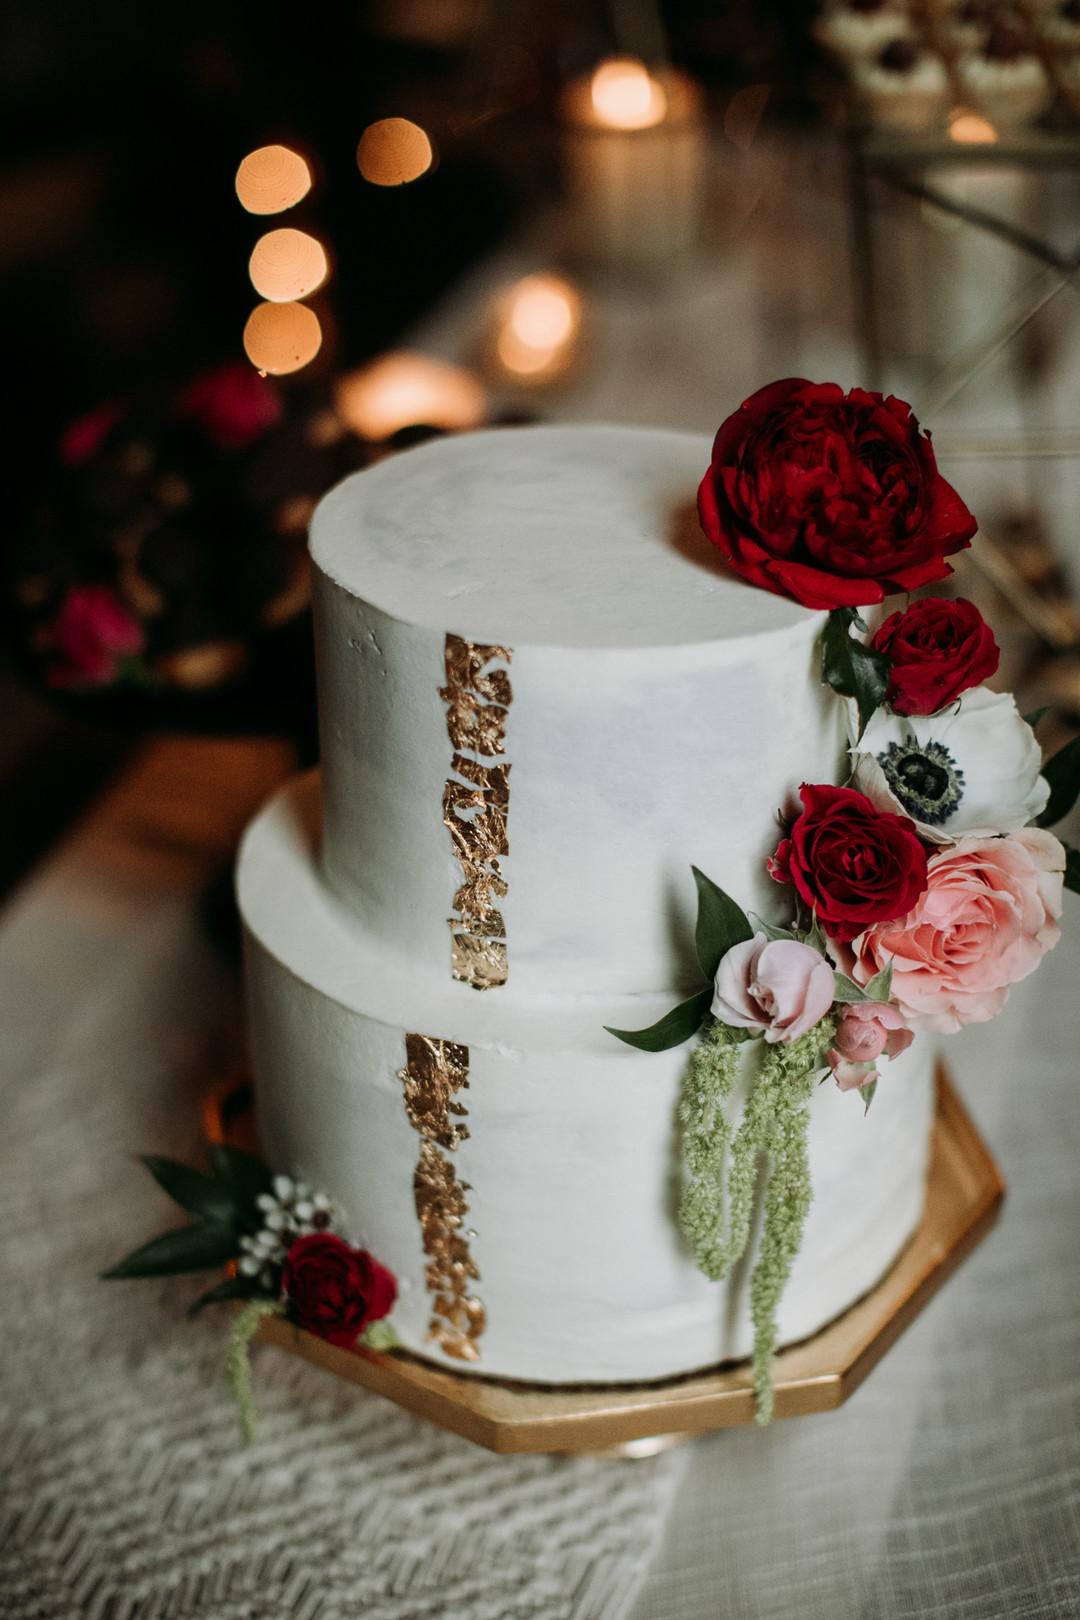 www.santabarbarawedding.com   Kacie Jones Photography   Dana Powers House   FM Events   S&O Dessert Co   Flourish   Blush Fine Linens   Embellish Vintage Rentals   All About Events   wedding cake